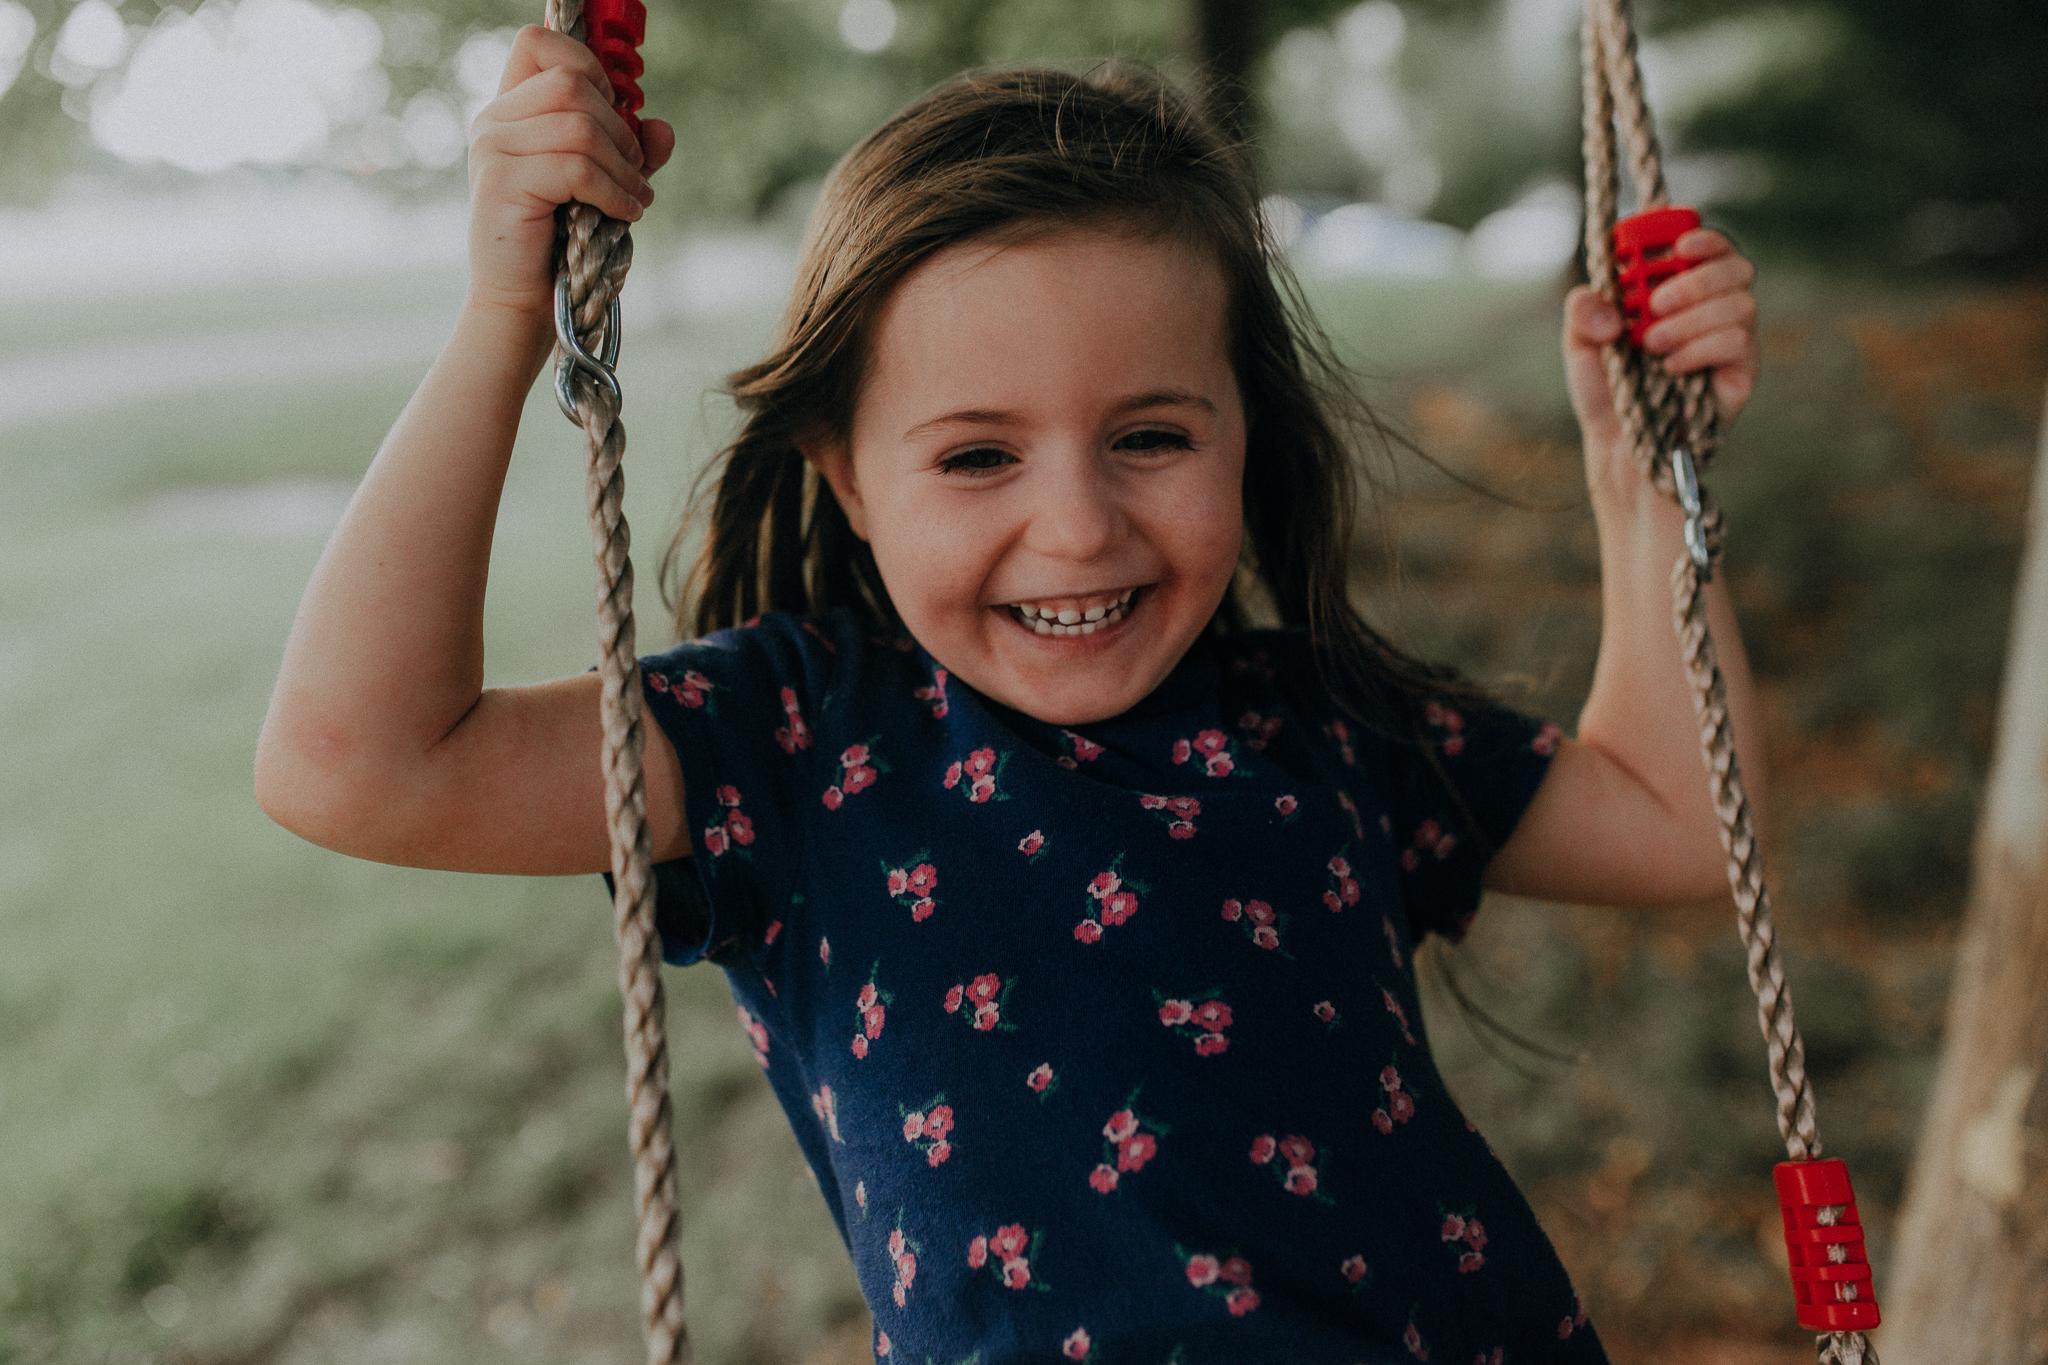 girl on swing laughing summer Ashburn Loudoun Northern Virginia family lifestyle documentary childhood Marti Austin Photography